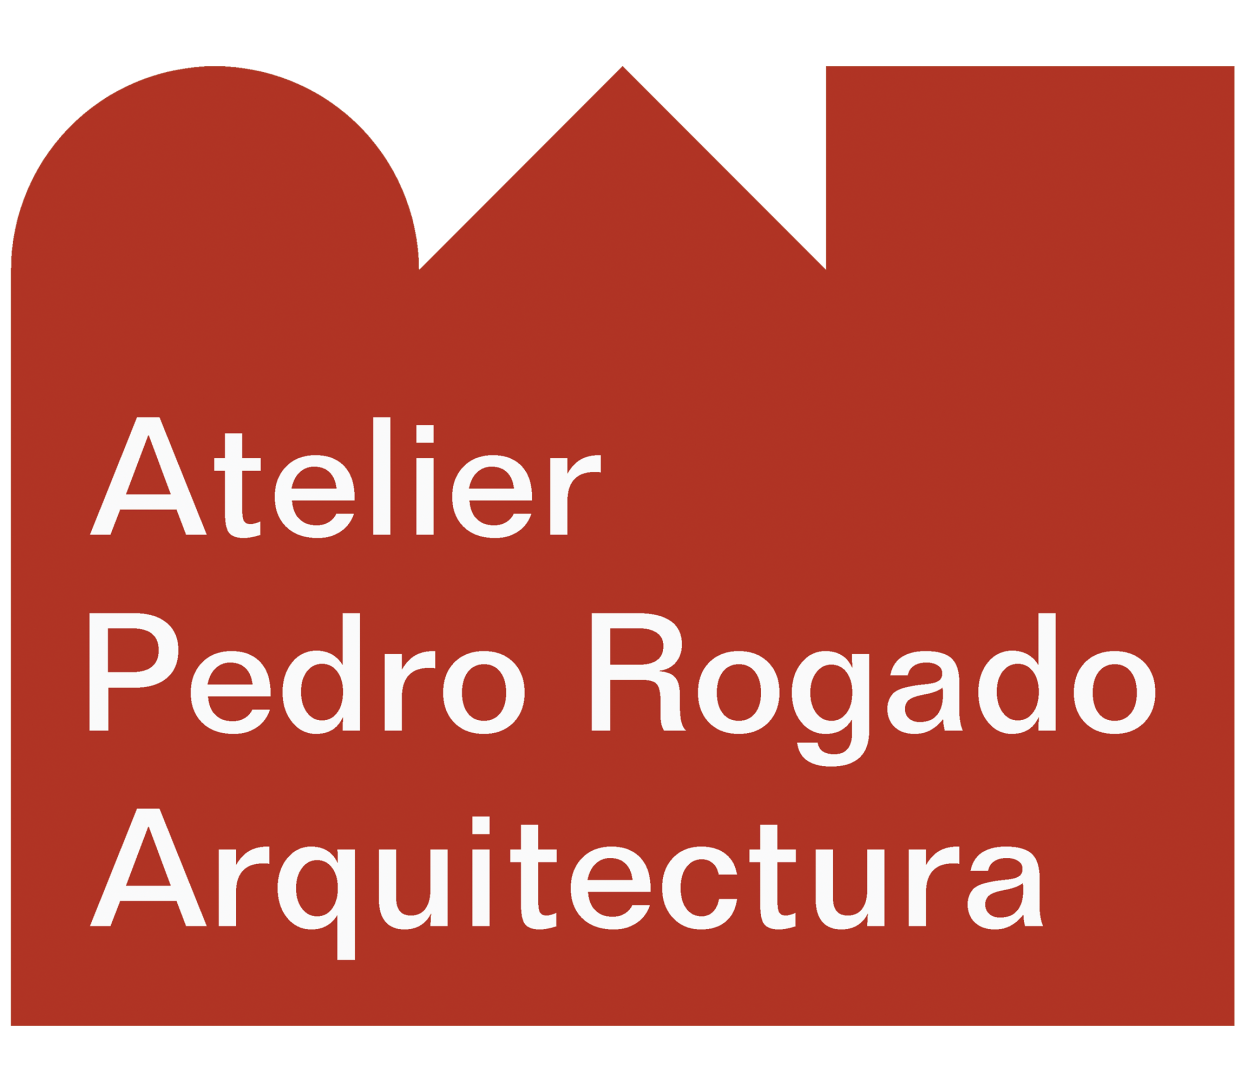 05-atelier-pedro-rogado-#02.png